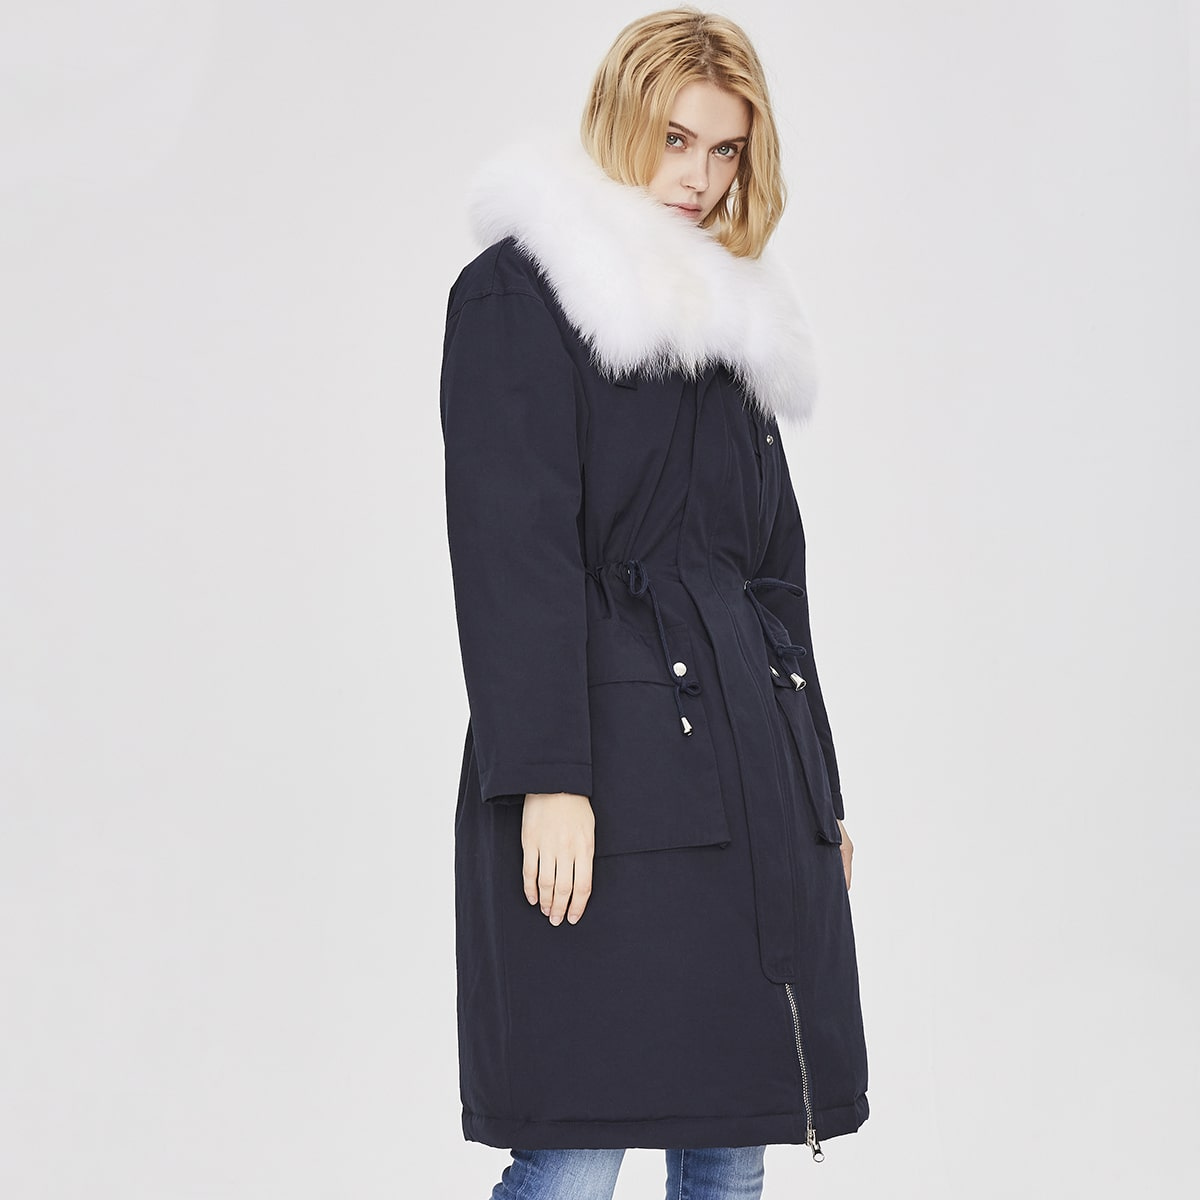 Drawstring Waist Flap Pocket Contrast Faux Fur Down Coat